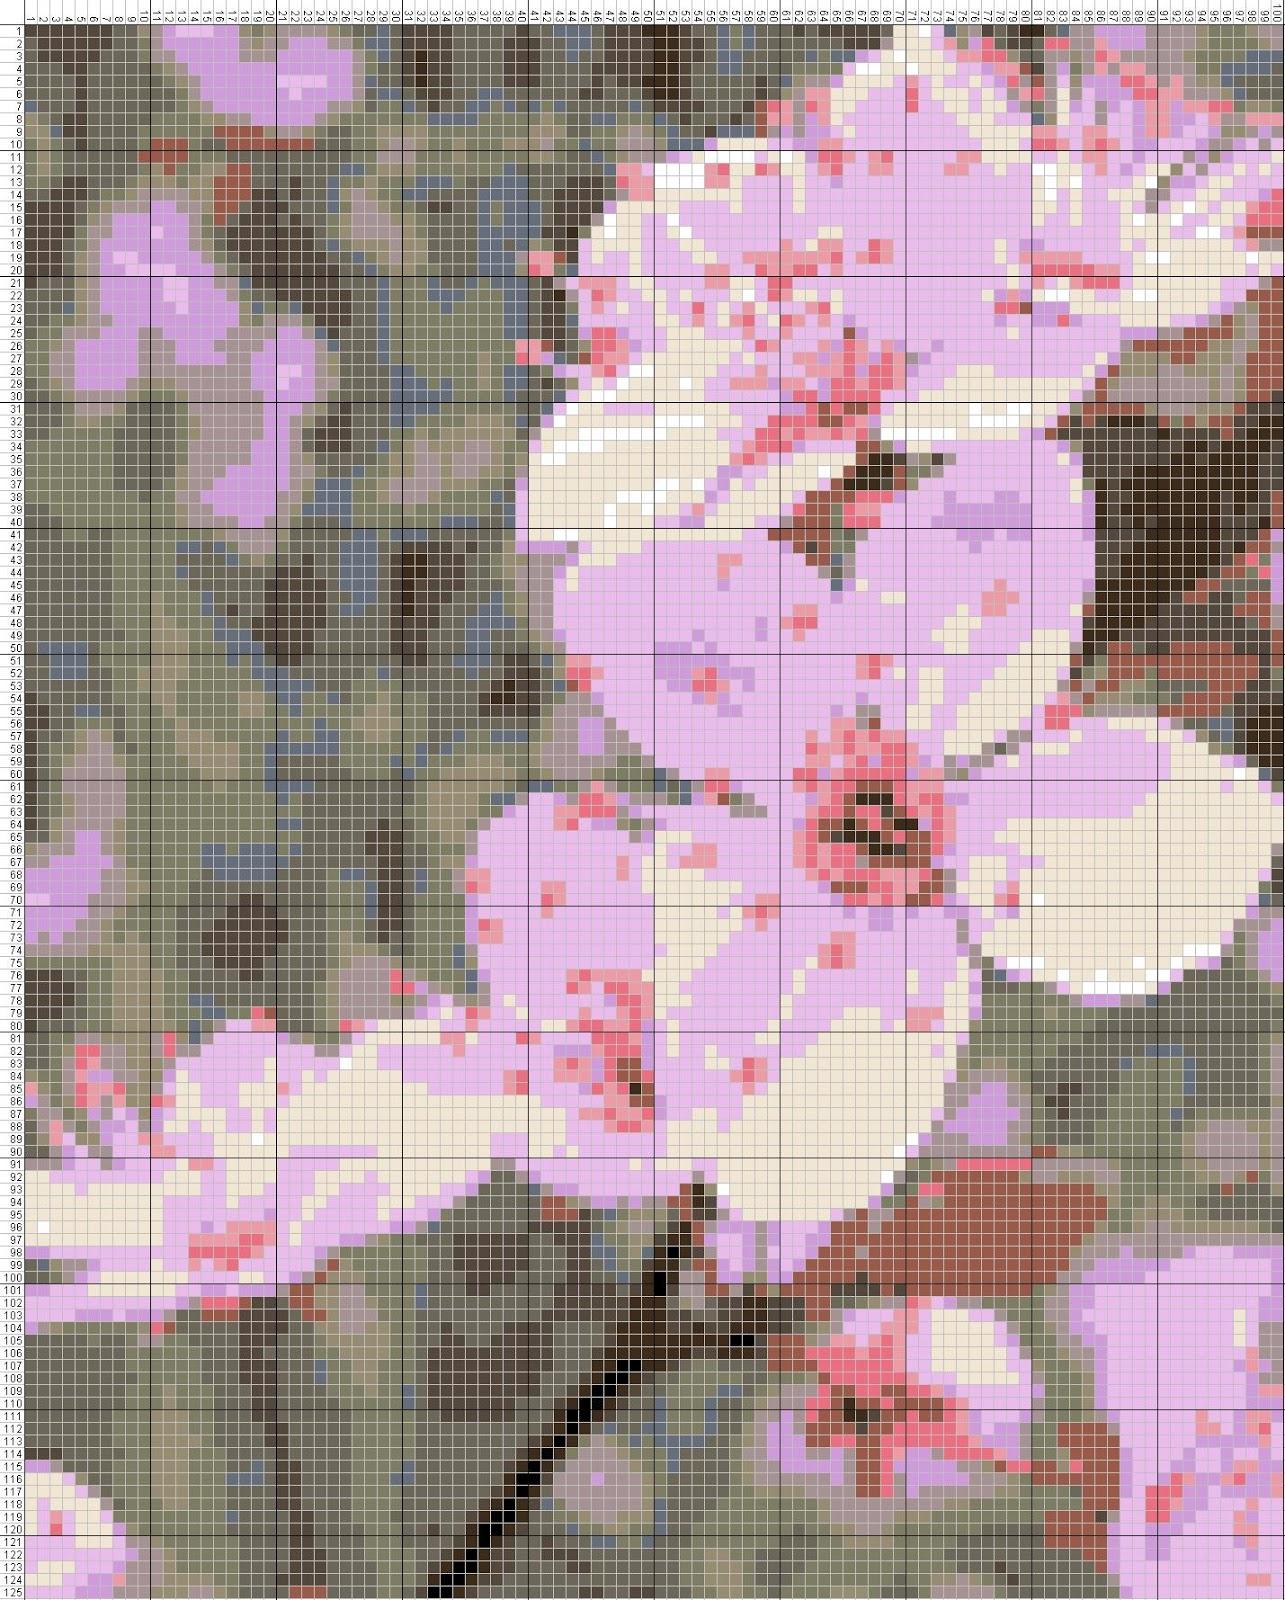 Gambar Pola Kristik Bunga Sakura Merah Muda Jepang